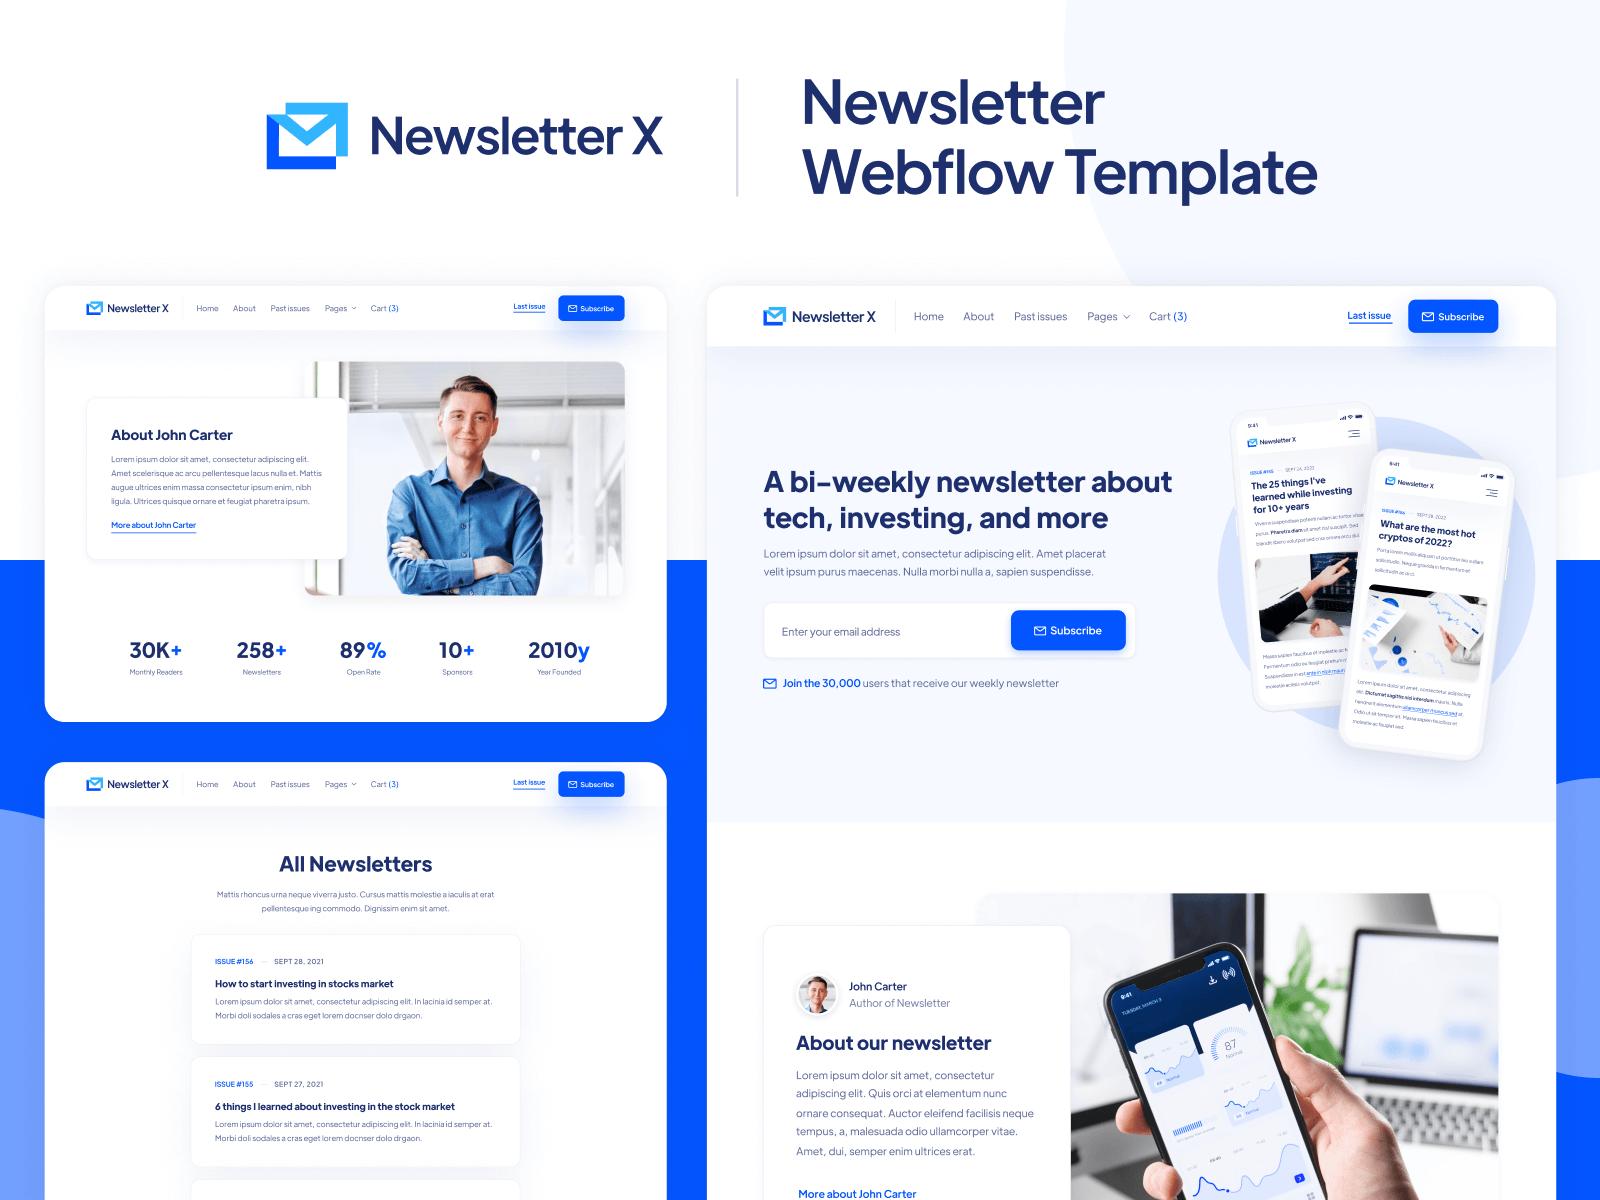 Newsletter Webflow Template